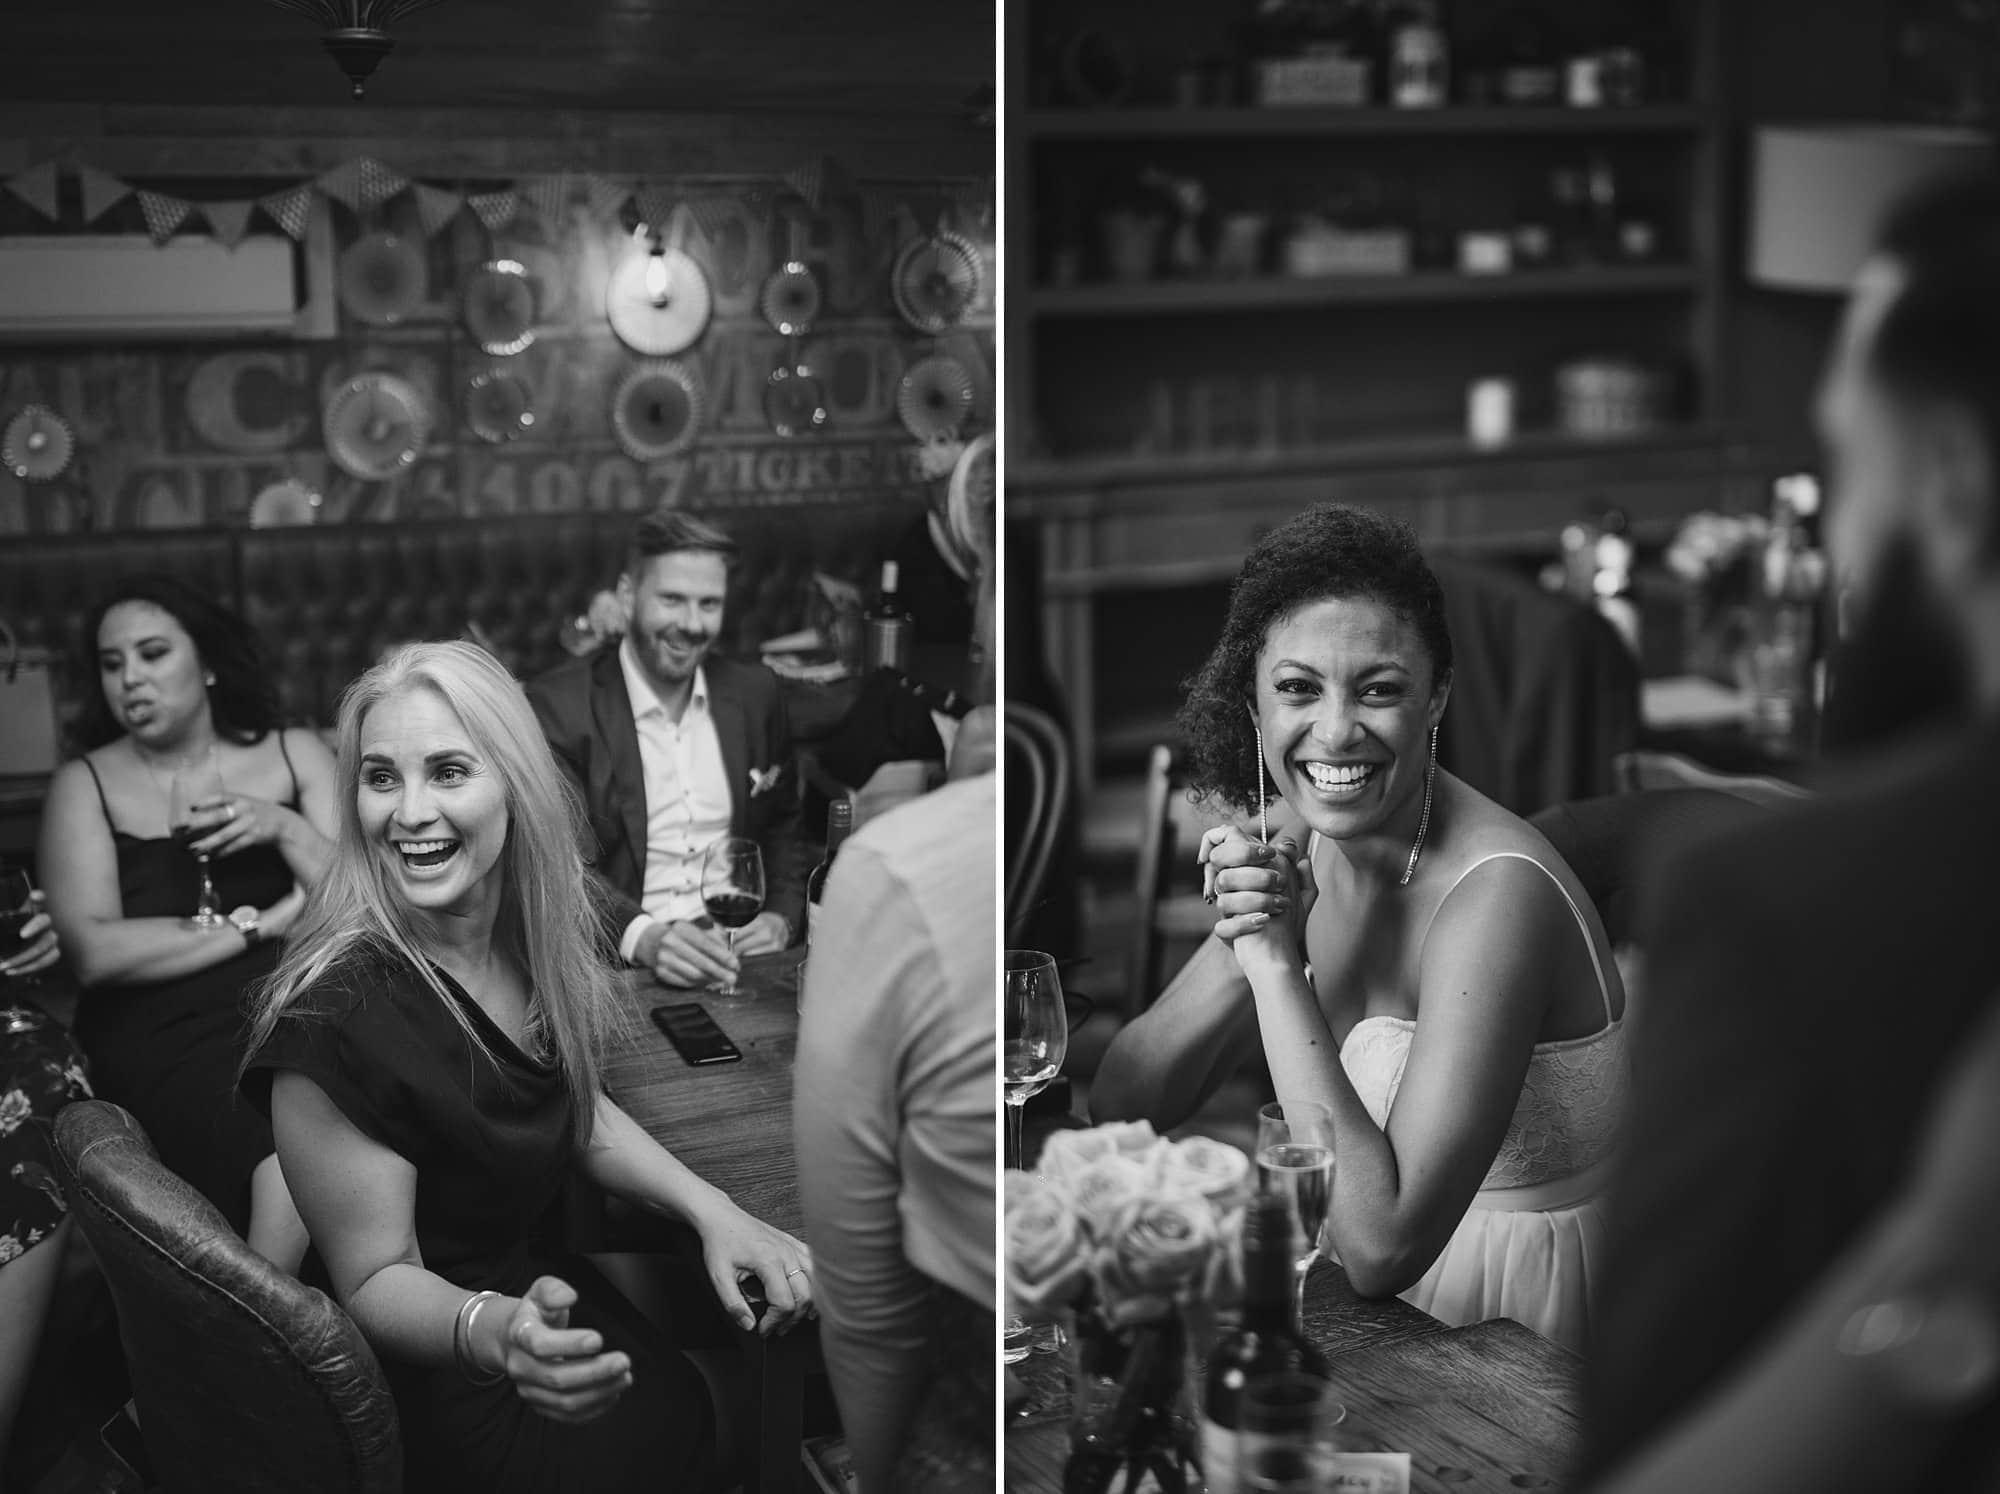 london pub wedding photographer jn 076 - The County Arms Wedding Photographer   Jen & Nick